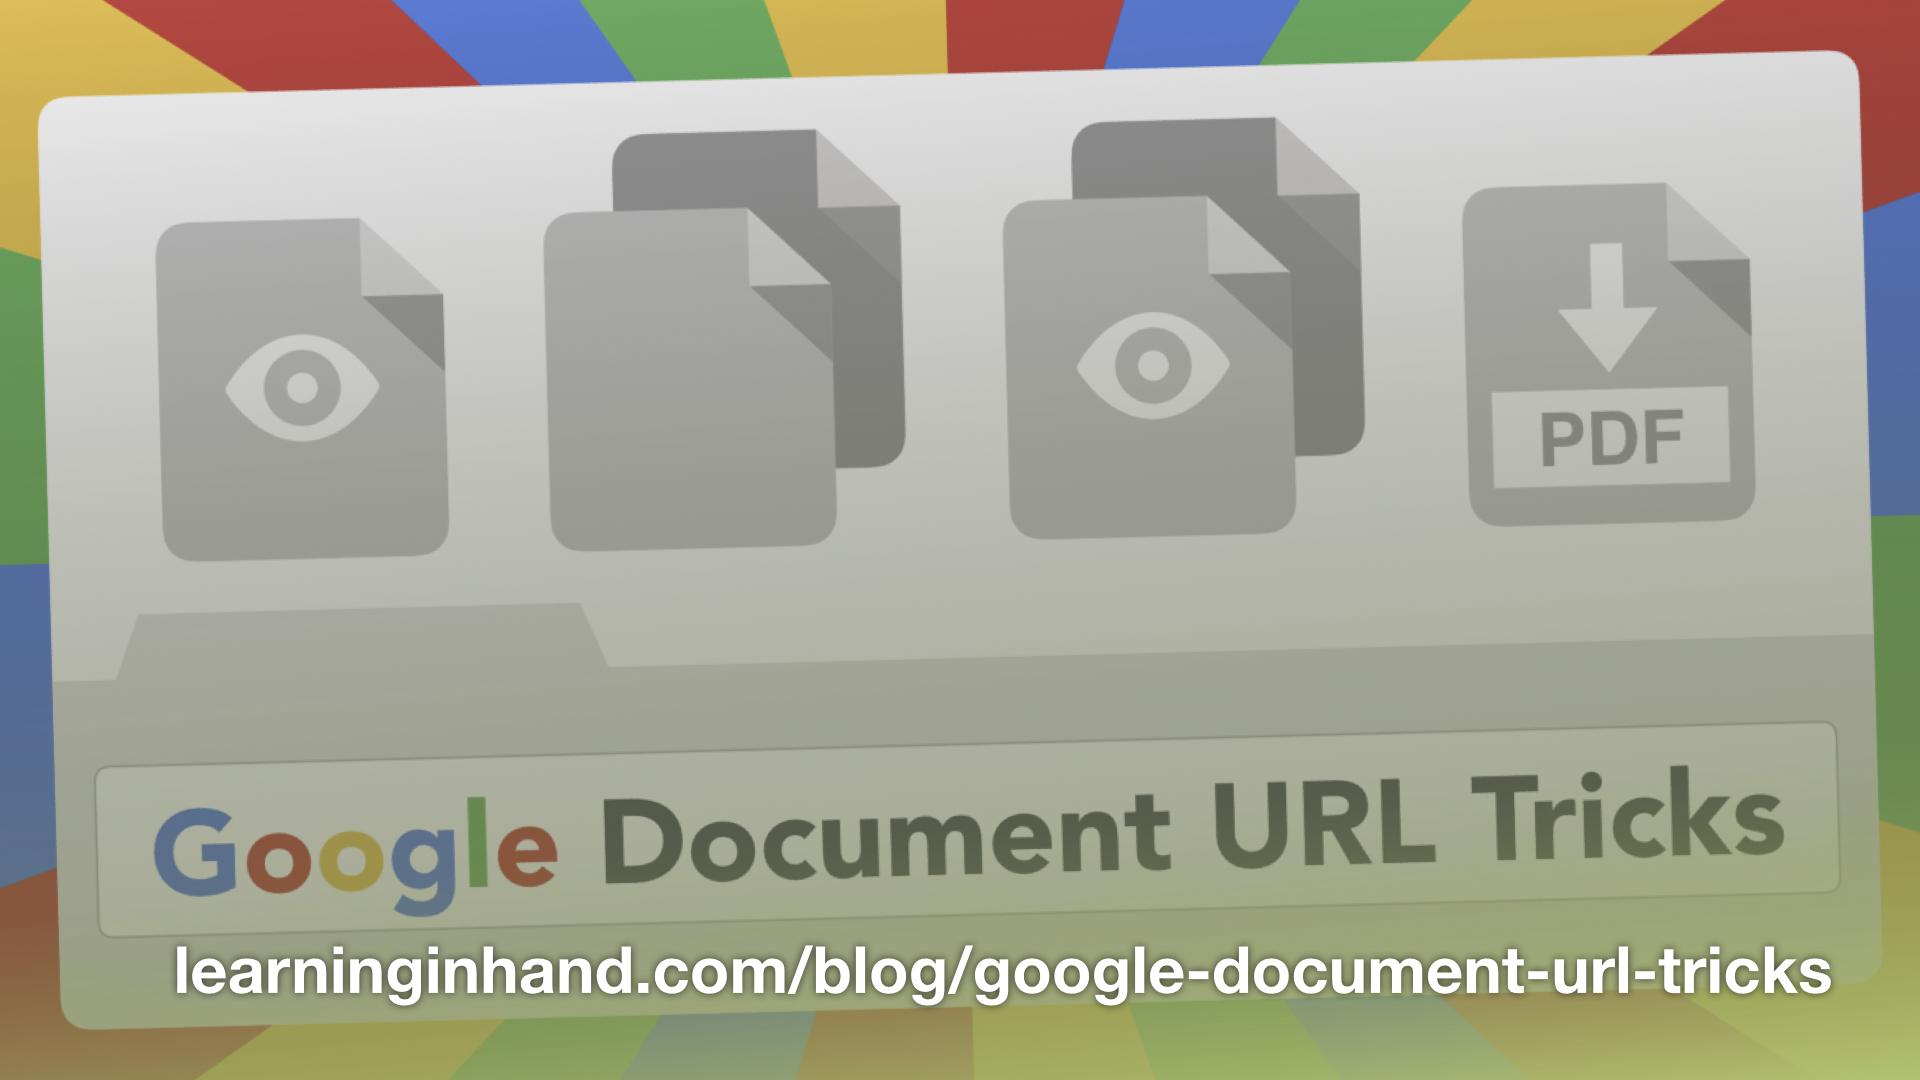 Google Document URL Tricks